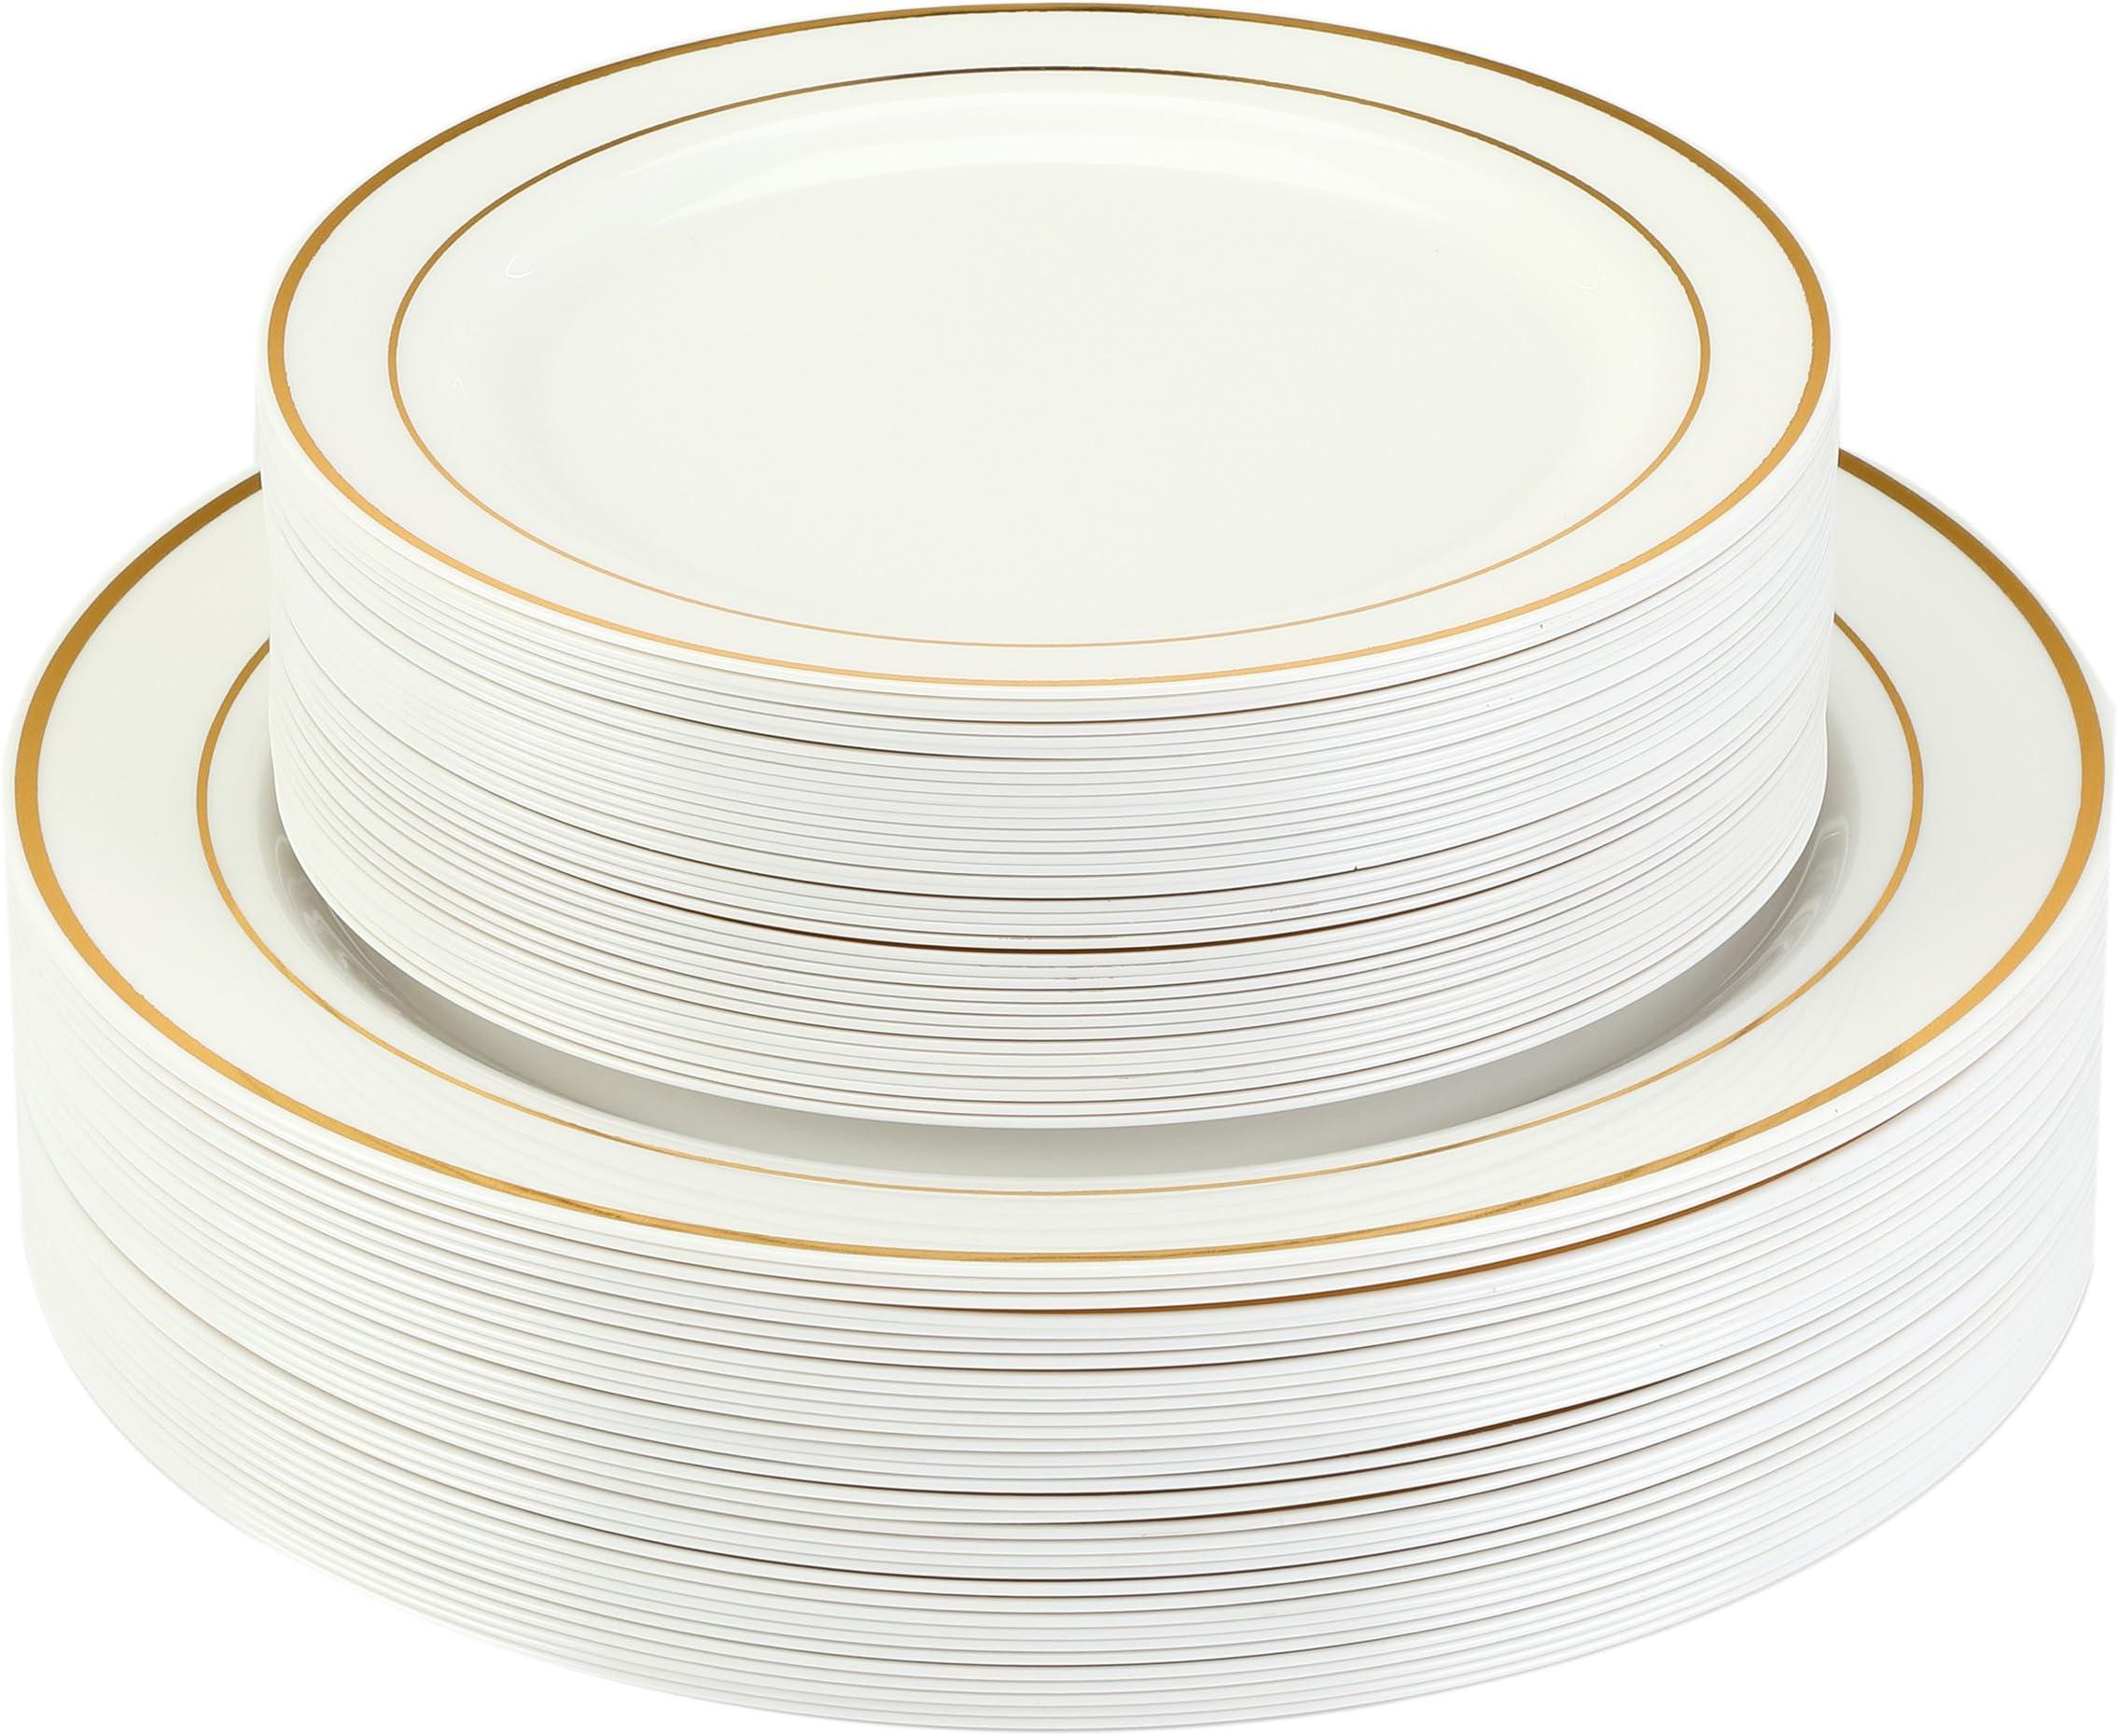 Premium Disposable Plastic Plates ...  sc 1 st  Amazon.com & Amazon.com: Plates - Disposable Plates Bowls \u0026 Cutlery: Health ...